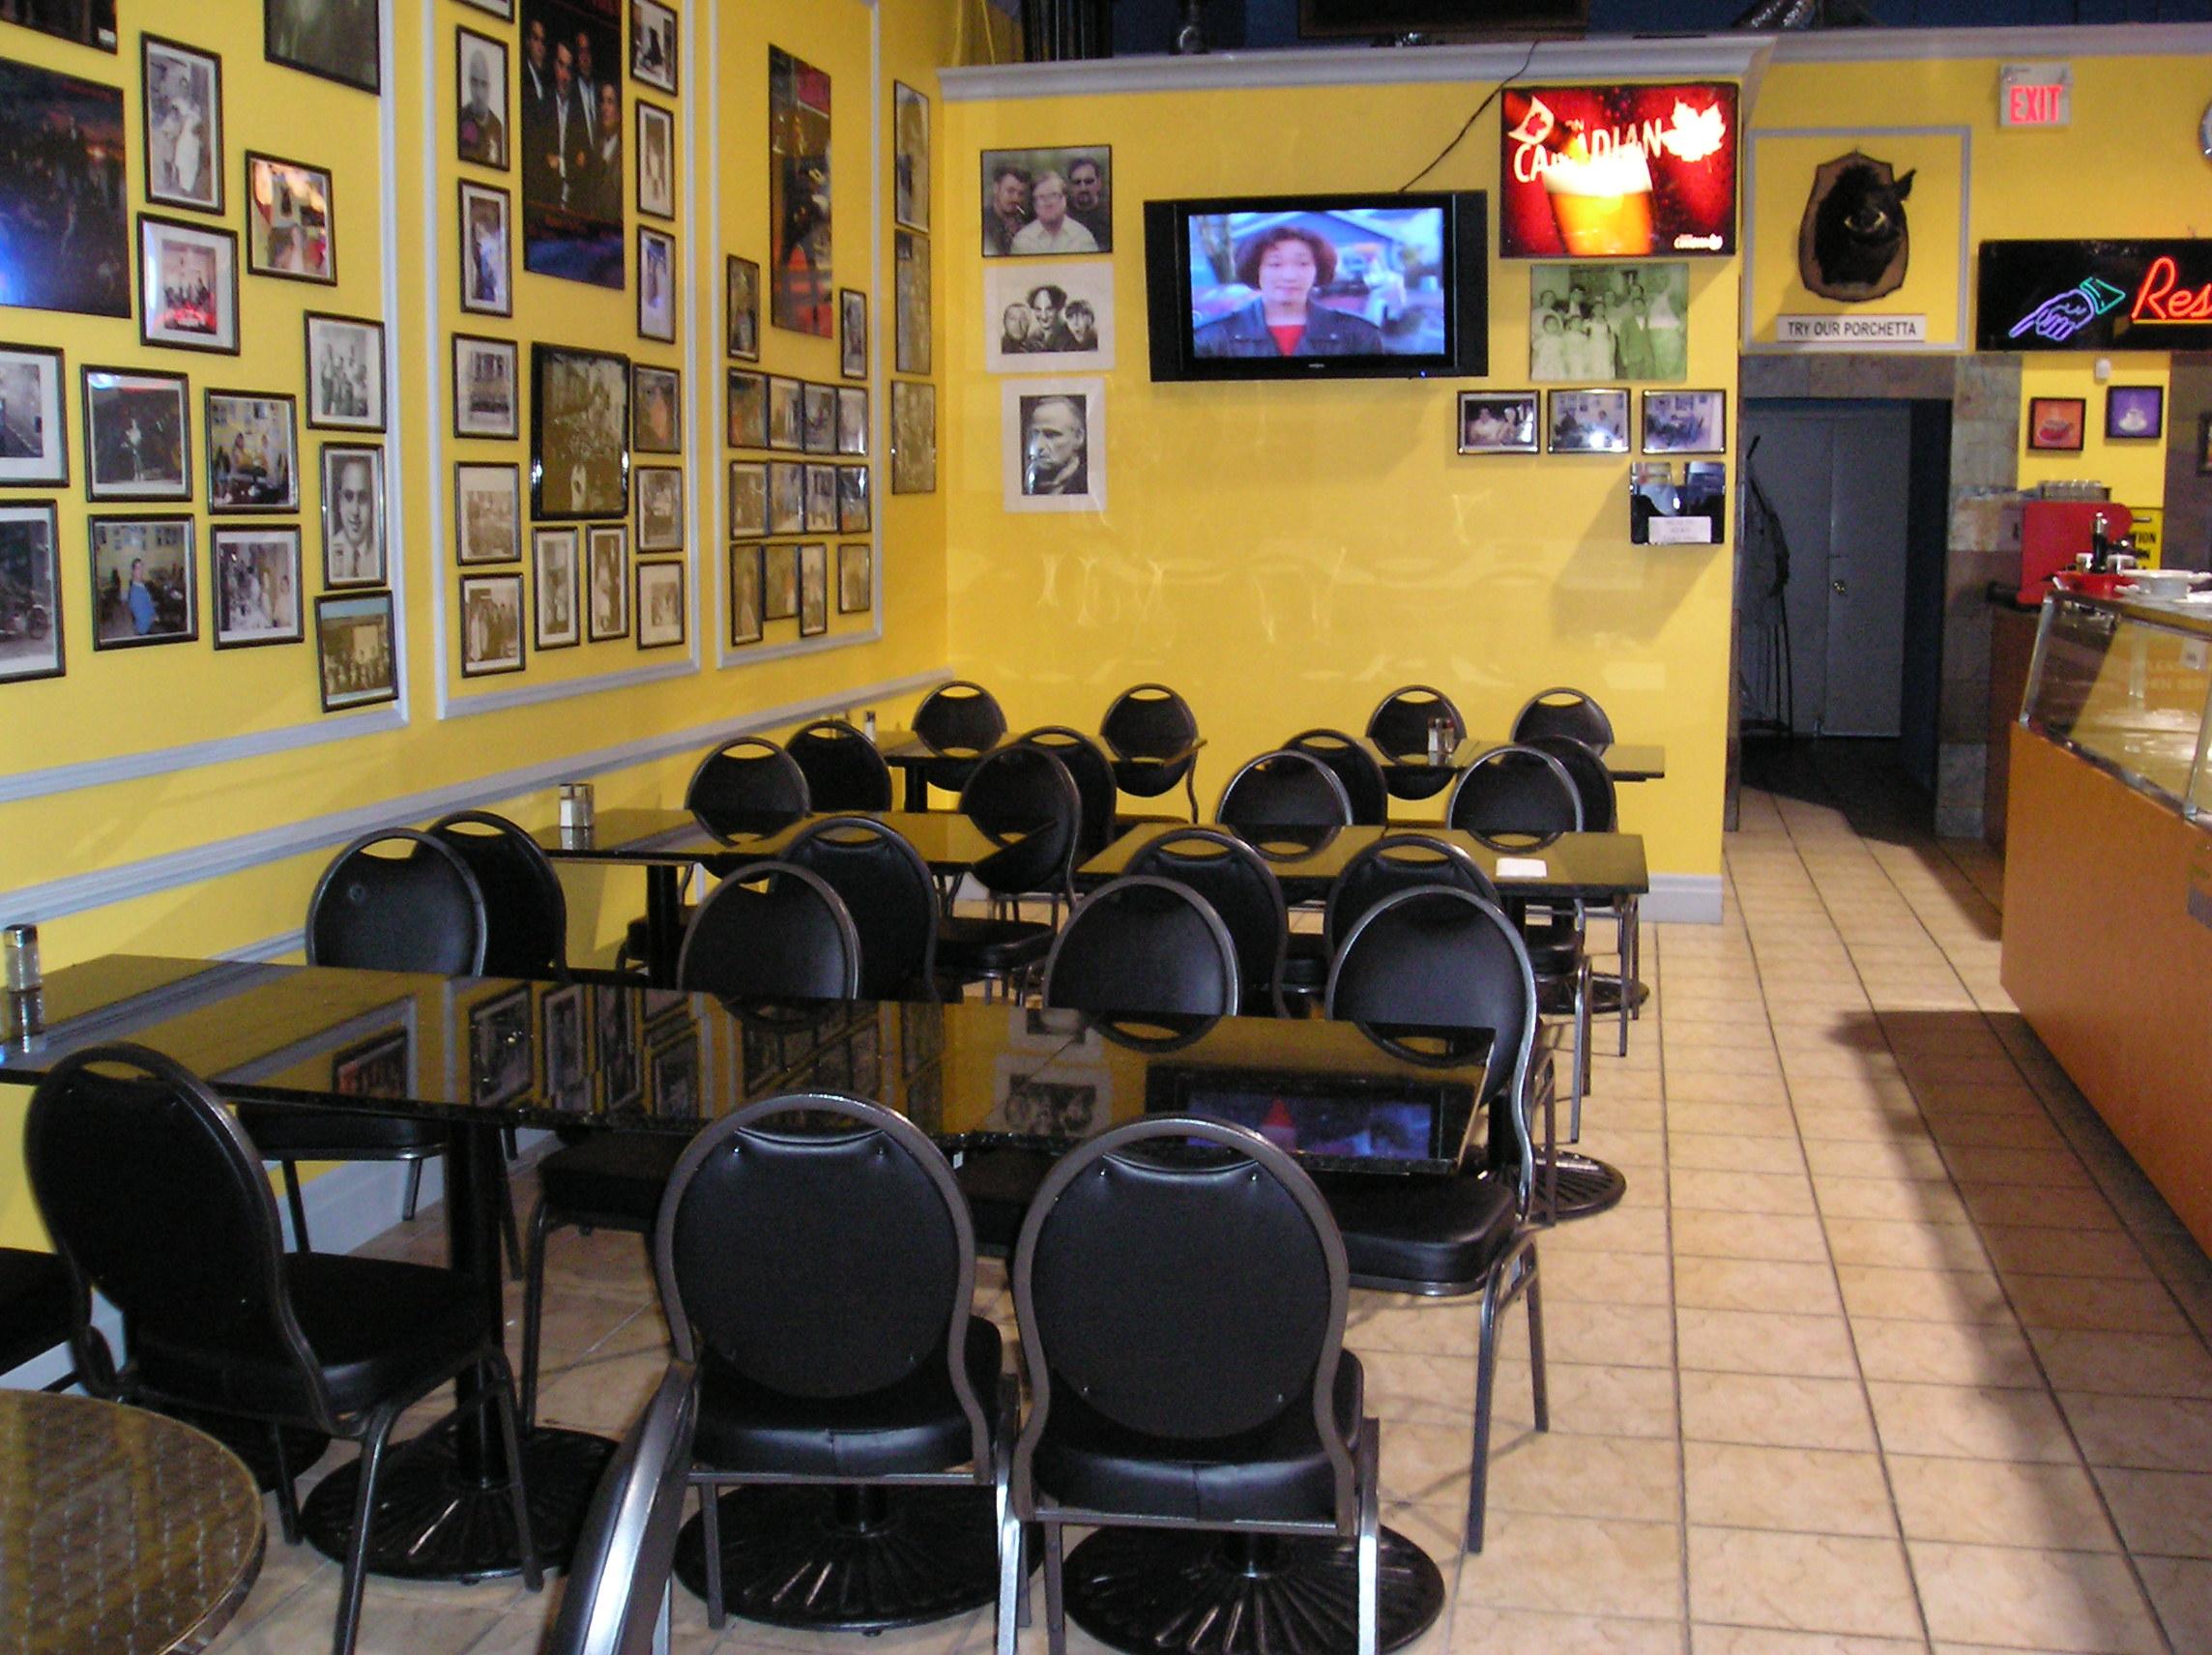 Italian Cafe West Th St